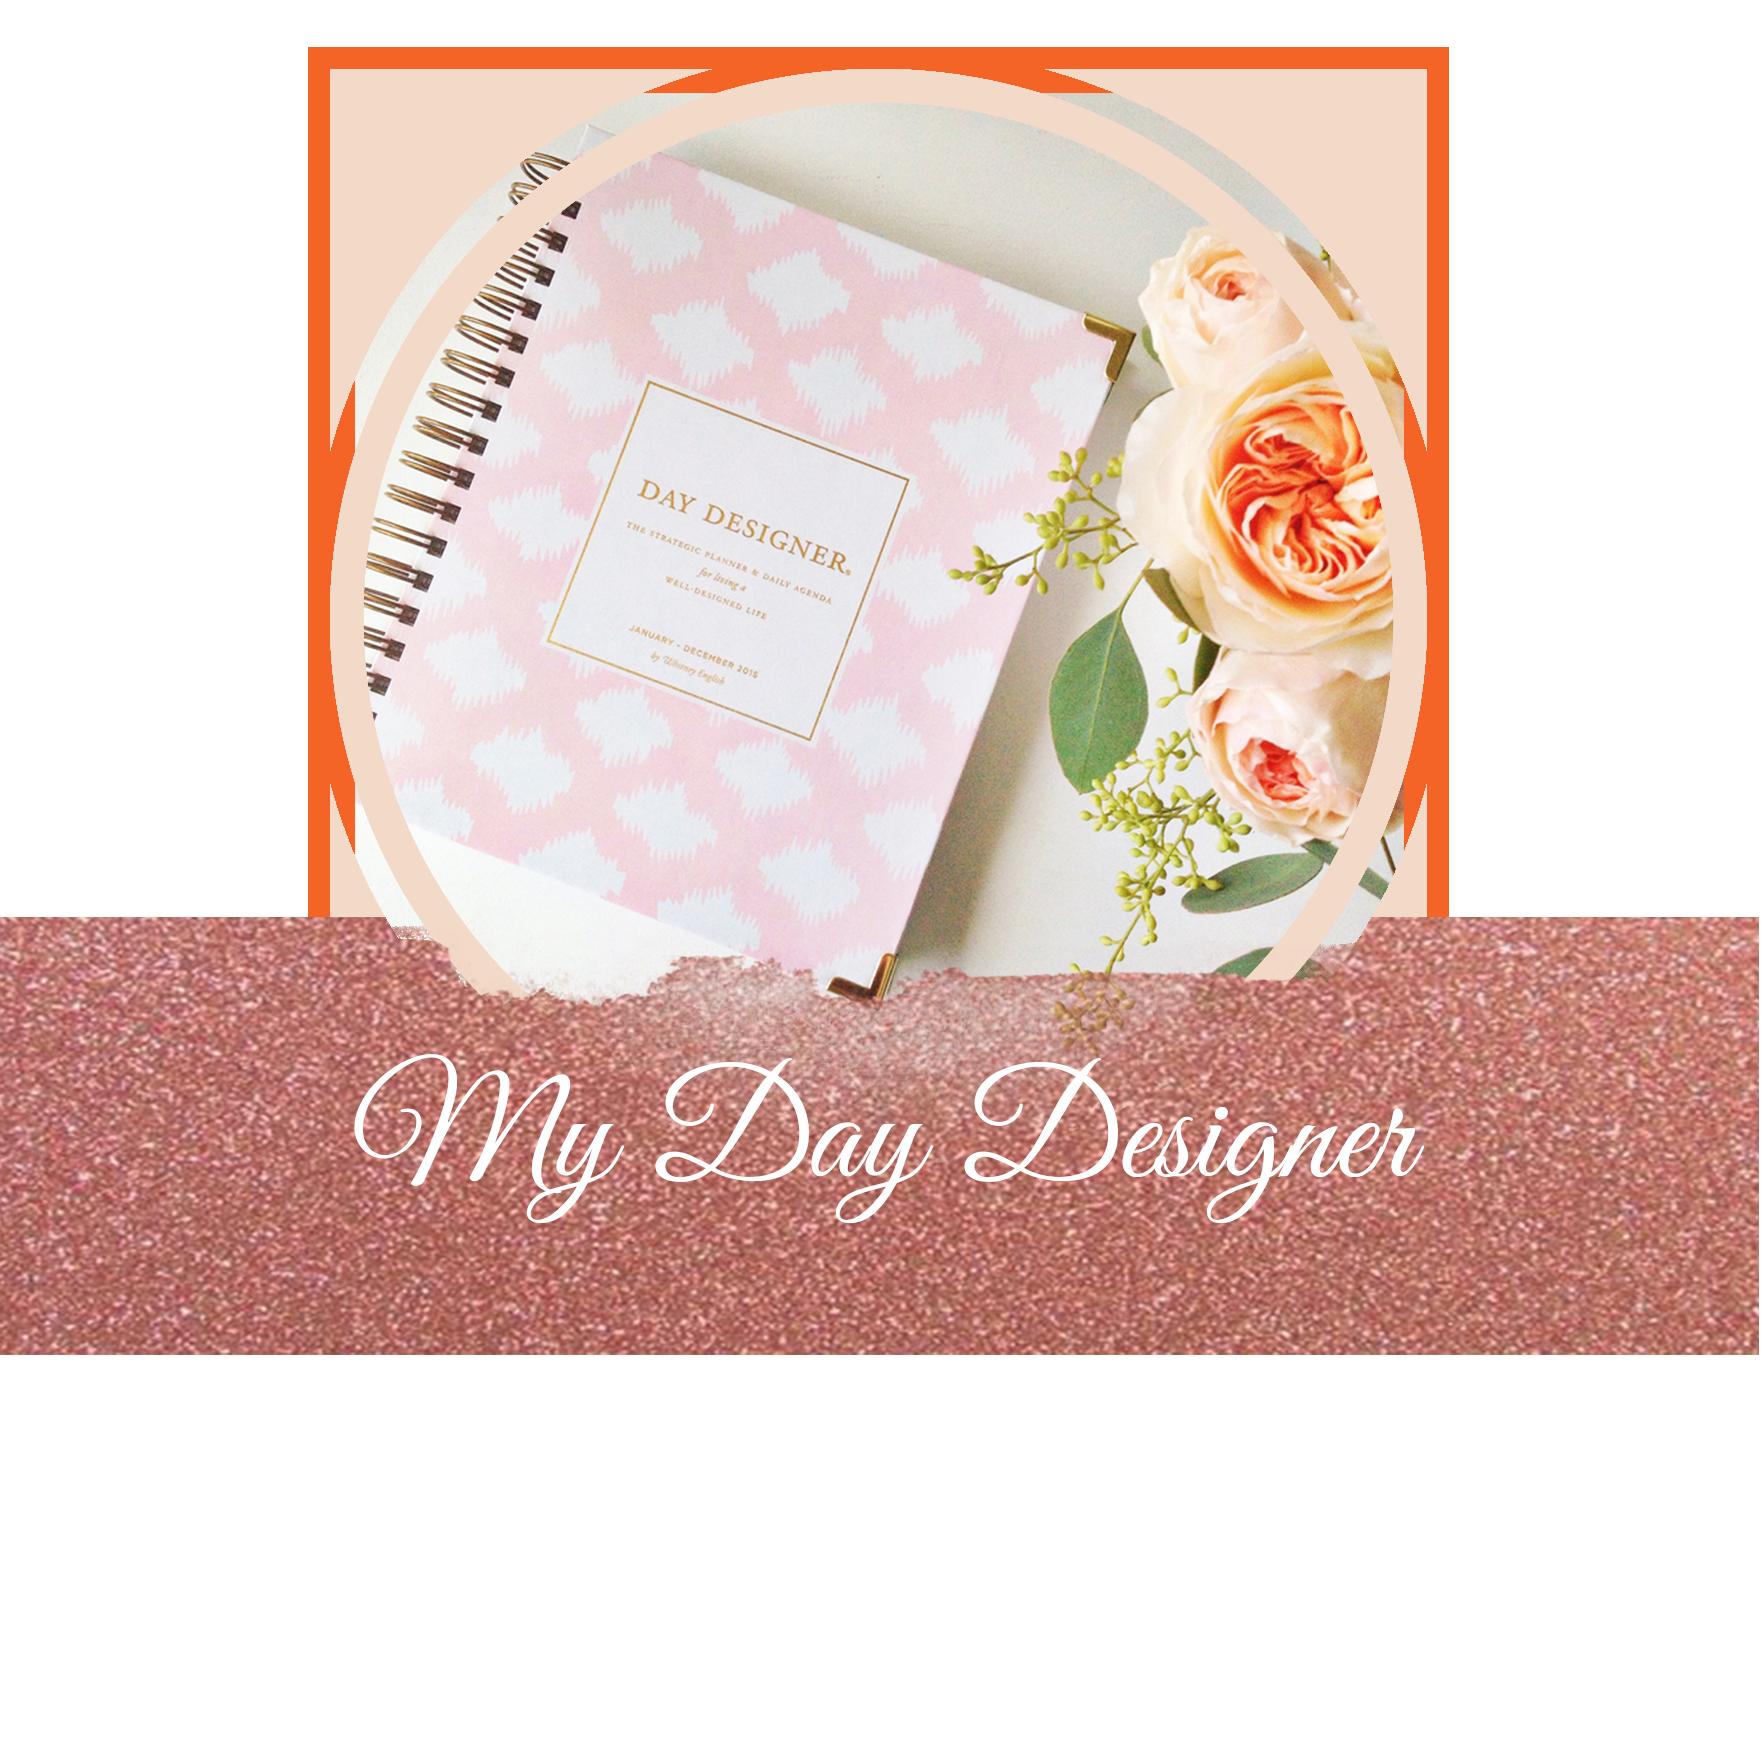 LDC & Co Day Designer